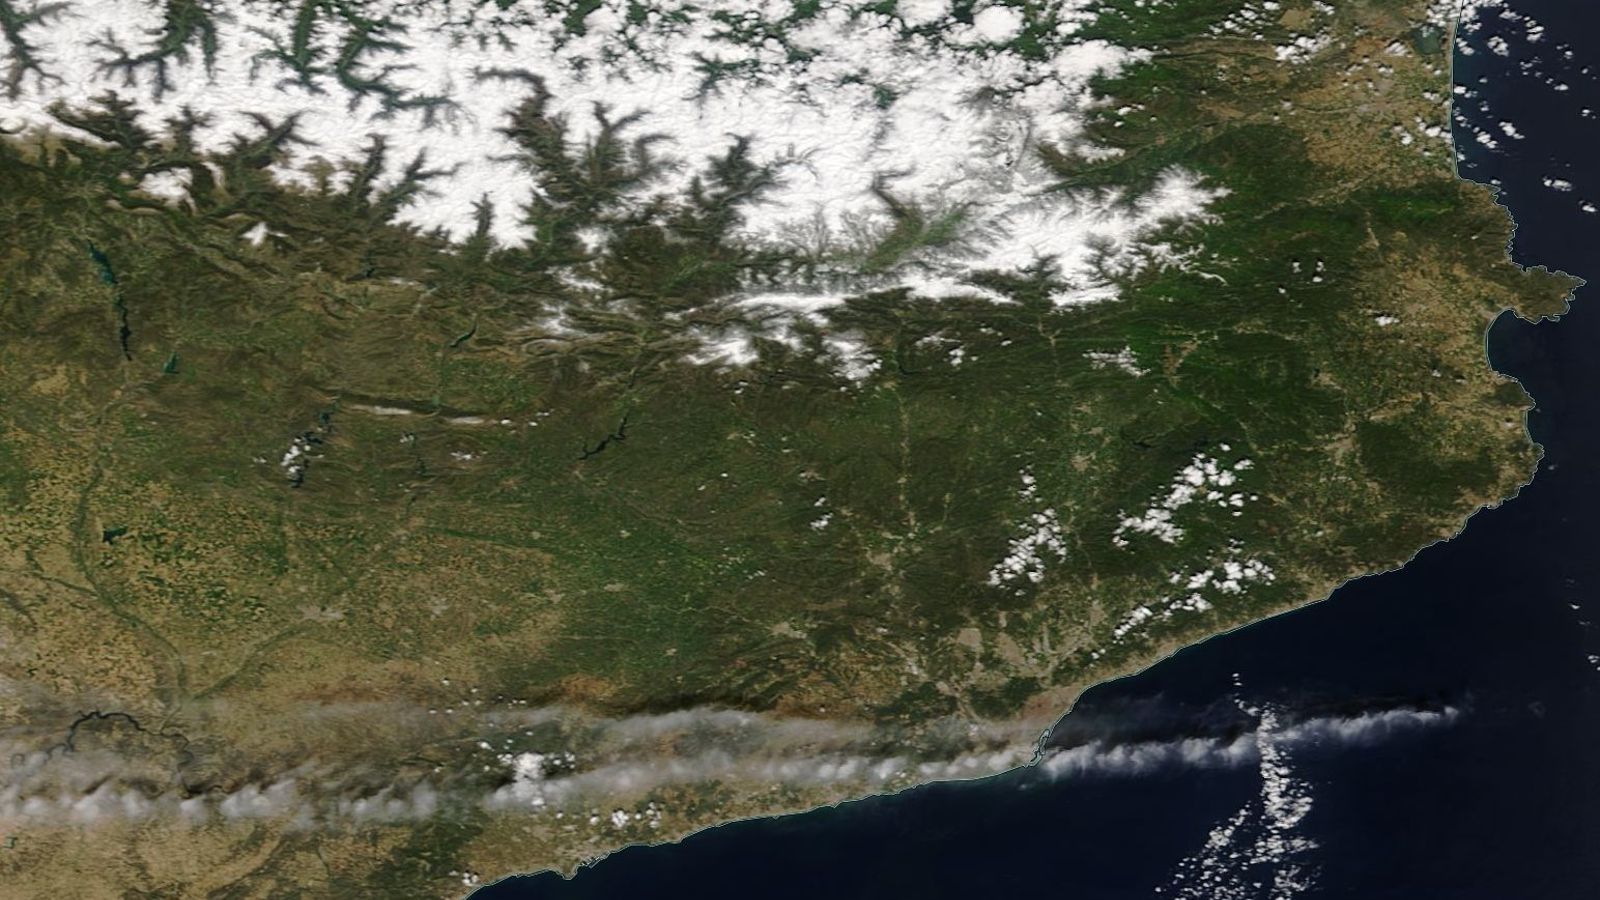 La nevada de dijous a vista de satèl·lit